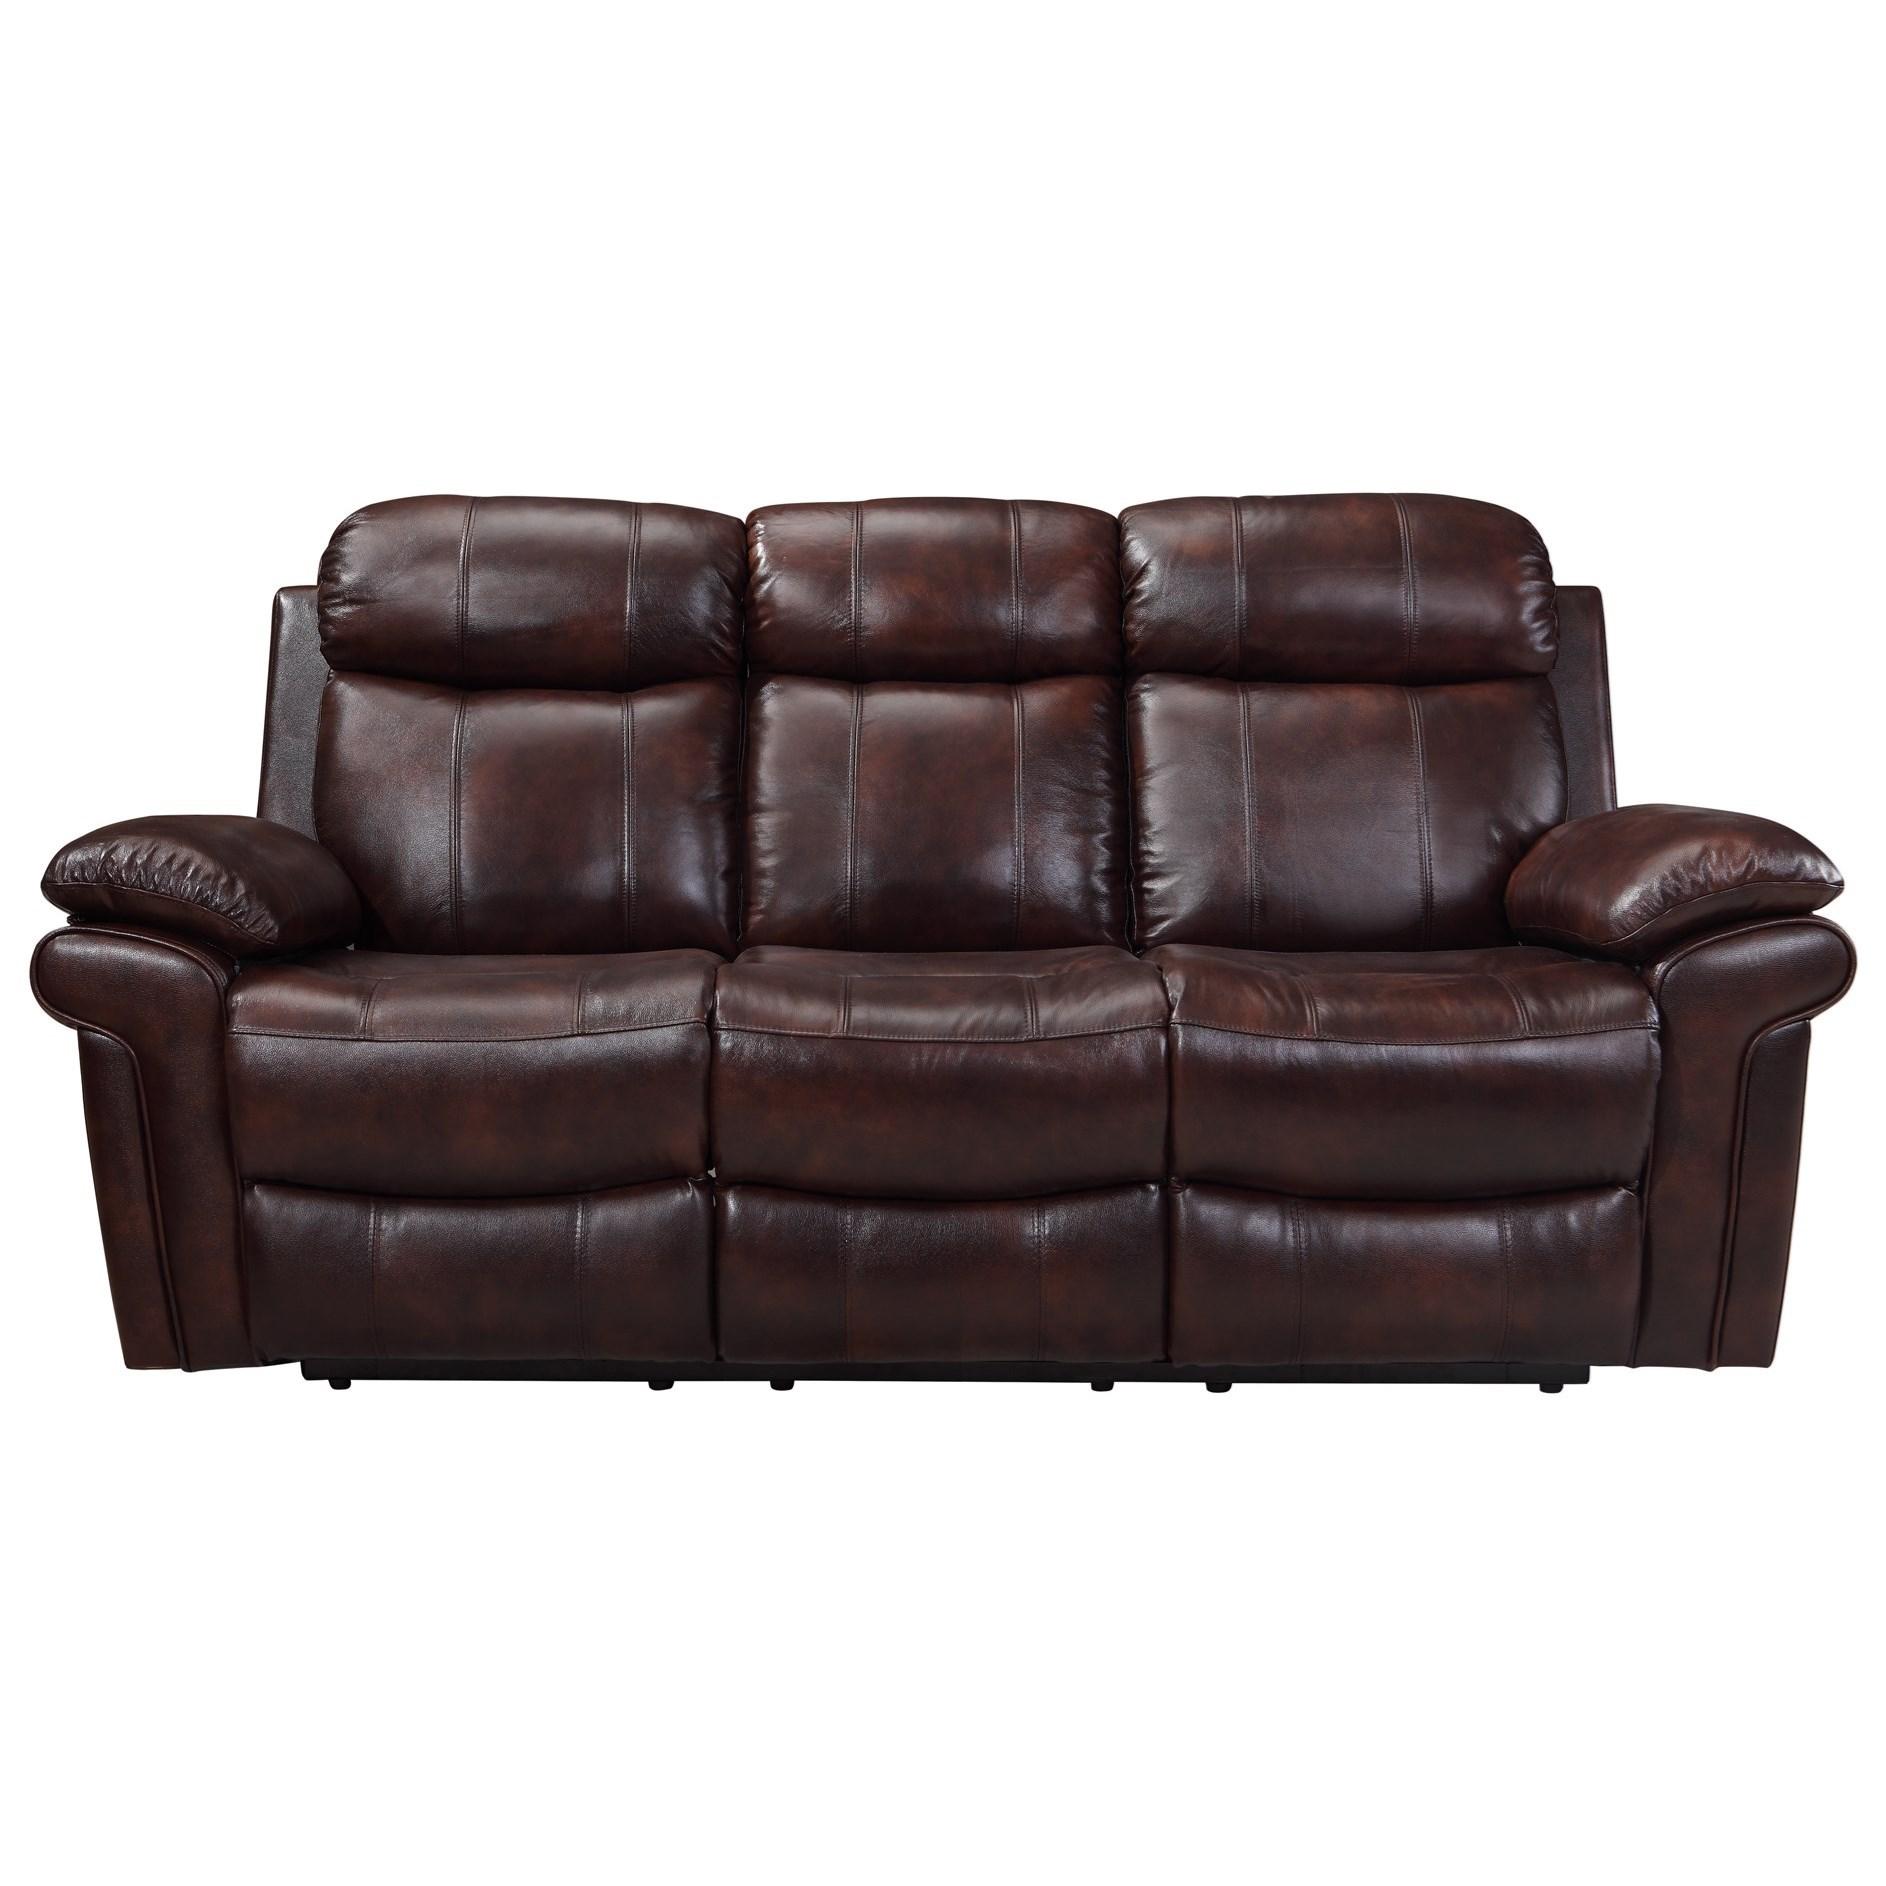 Leather Italia USA Shae   JoplinPower Reclining Leather Sofa ...